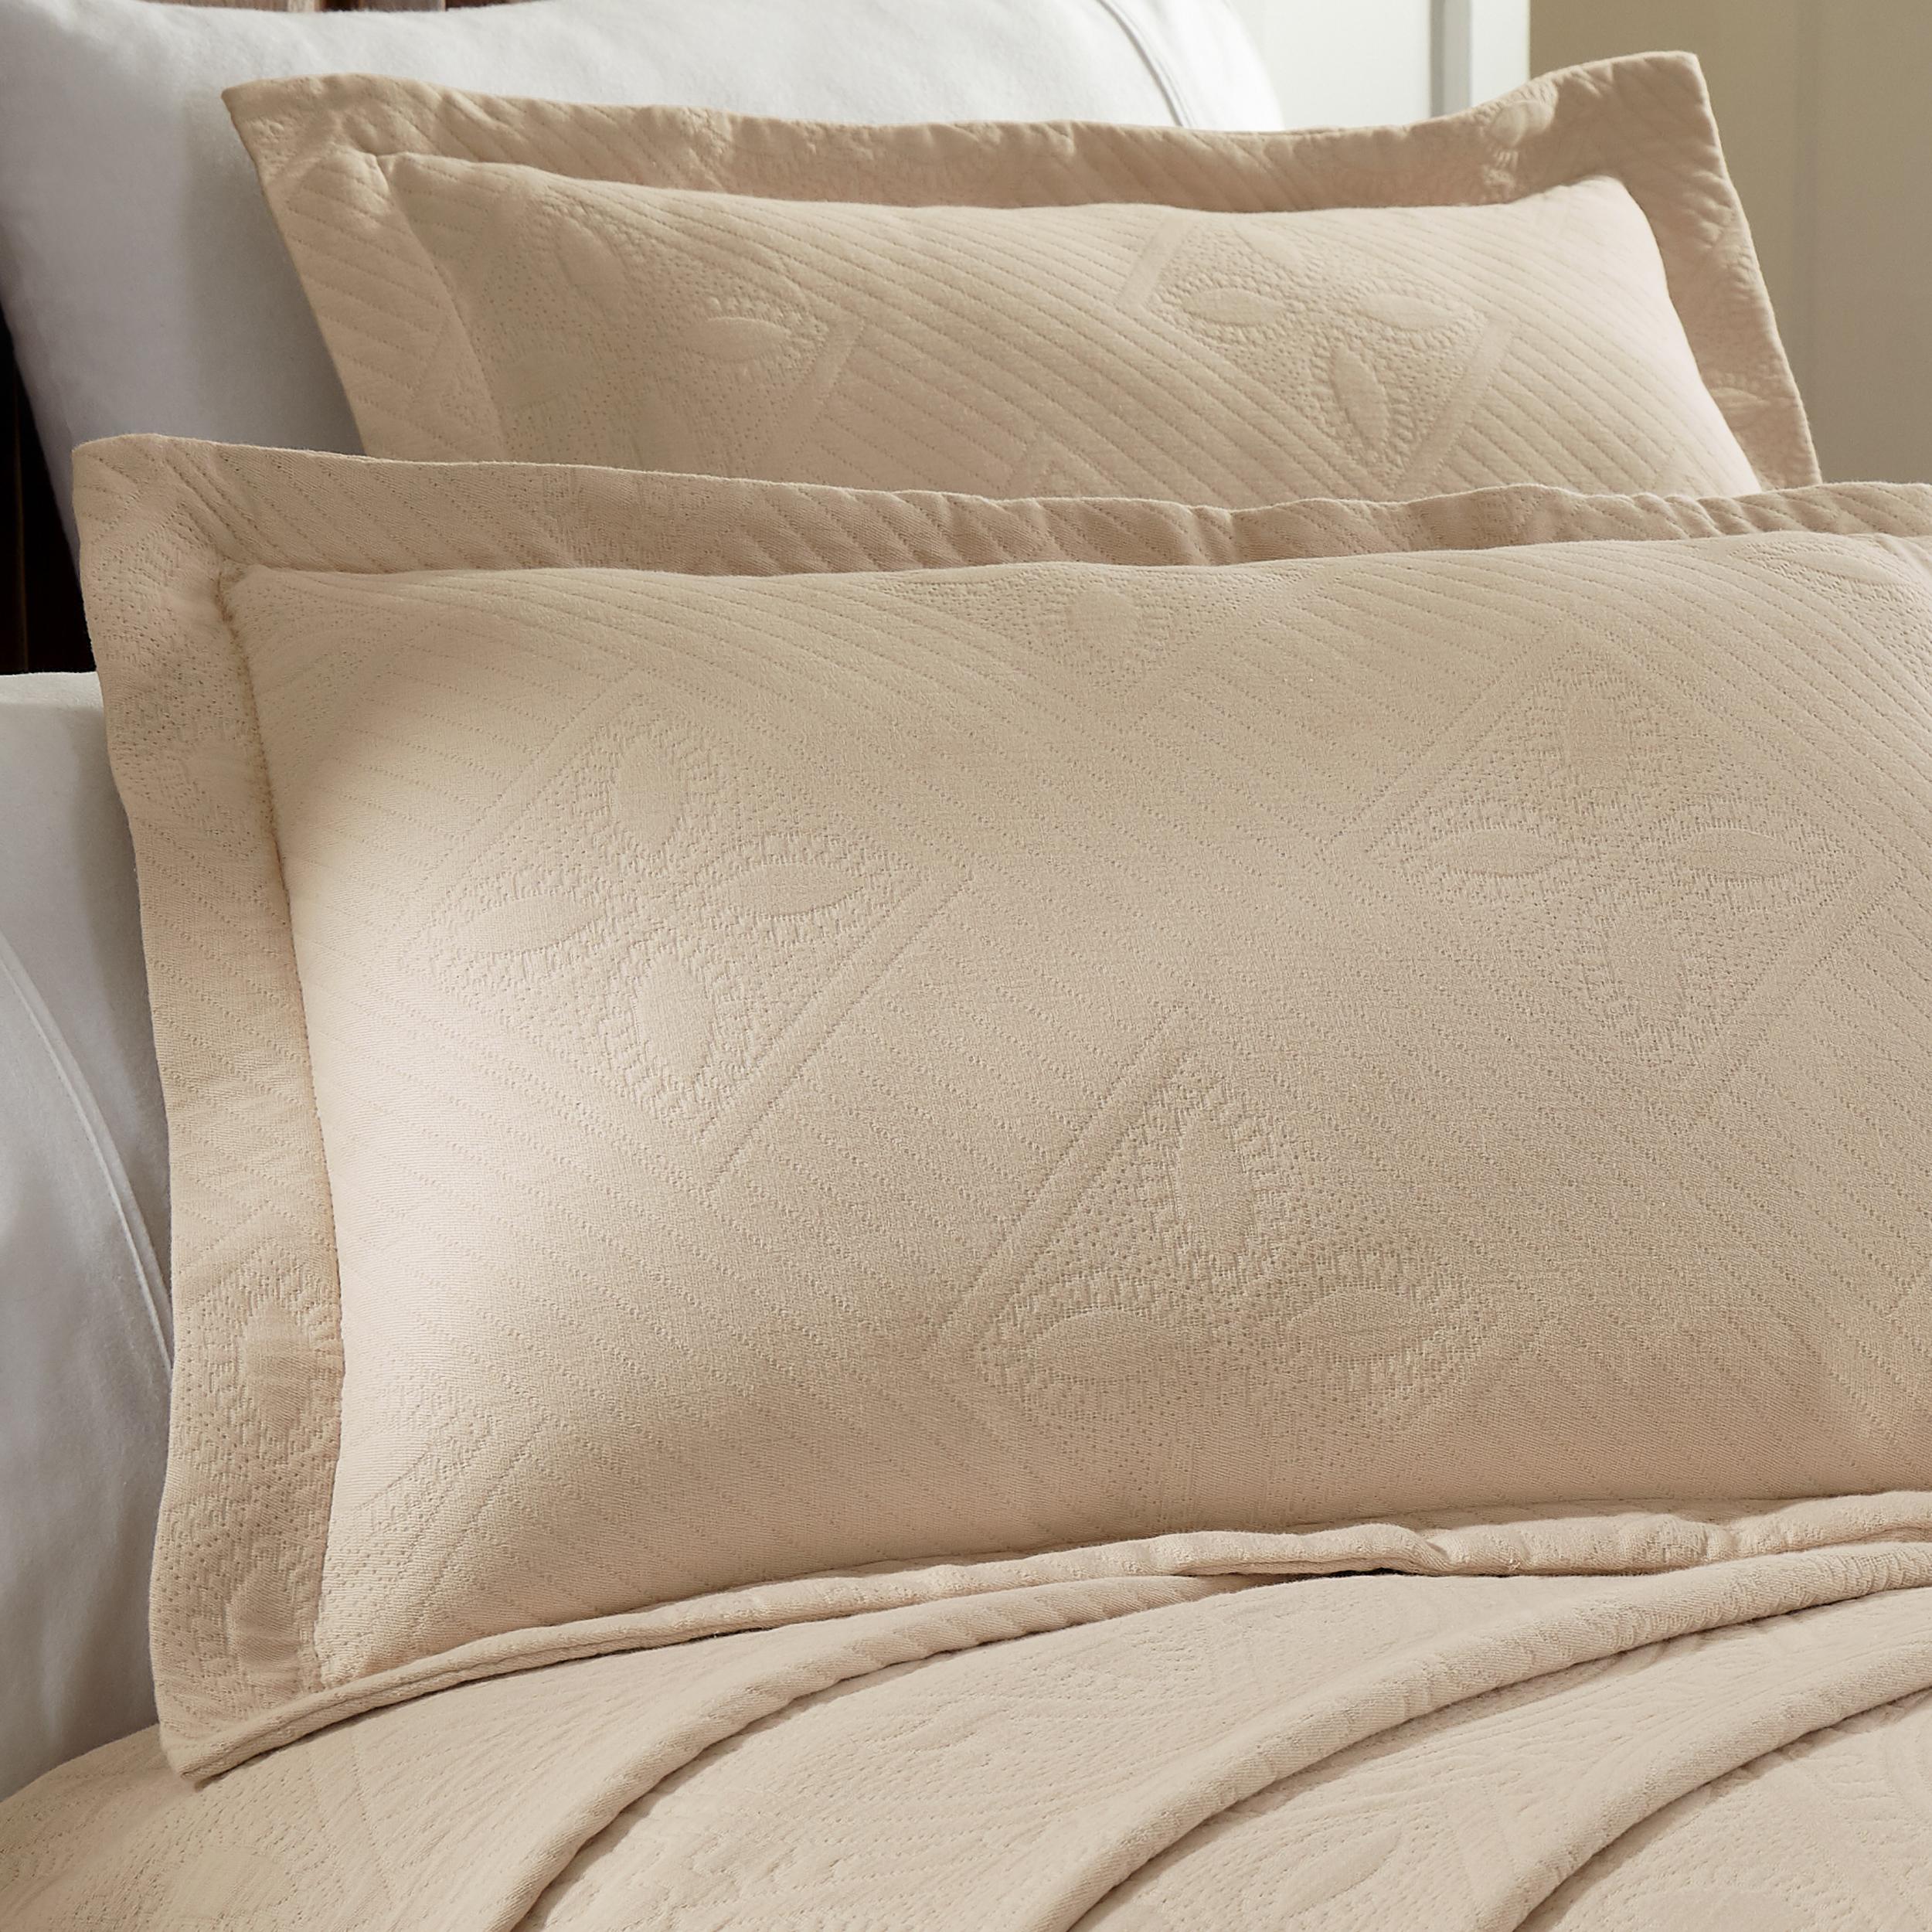 Celtic-Circle-Cotton-Jacquard-Matelasse-Scalloped-Bedspread-Set thumbnail 6